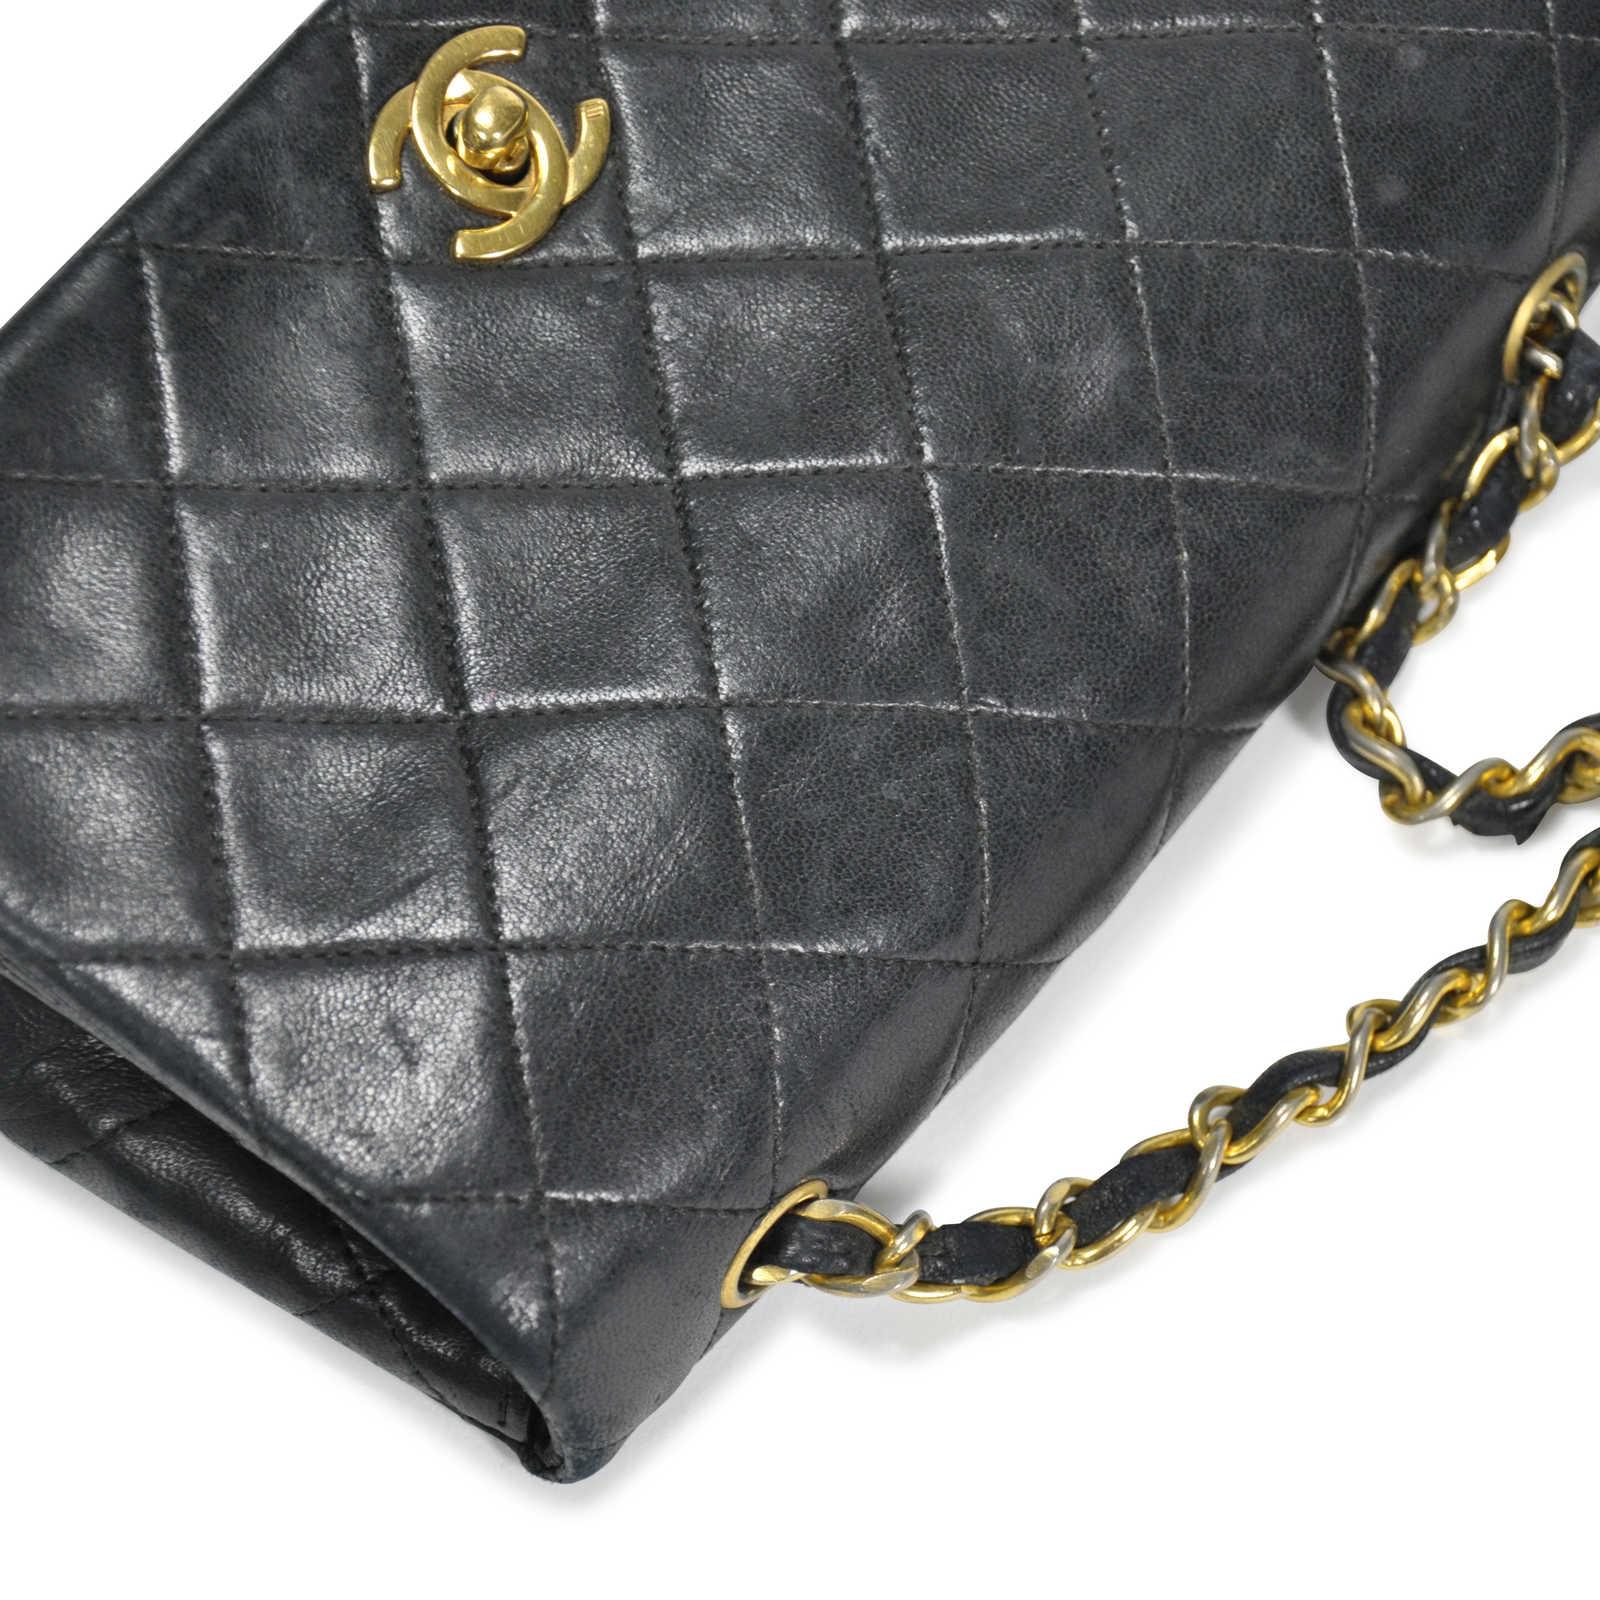 ... Authentic Vintage Chanel Mini Single Flap Crossbody (PSS-201-00004) -  Thumbnail ... 0135e19fc42e9